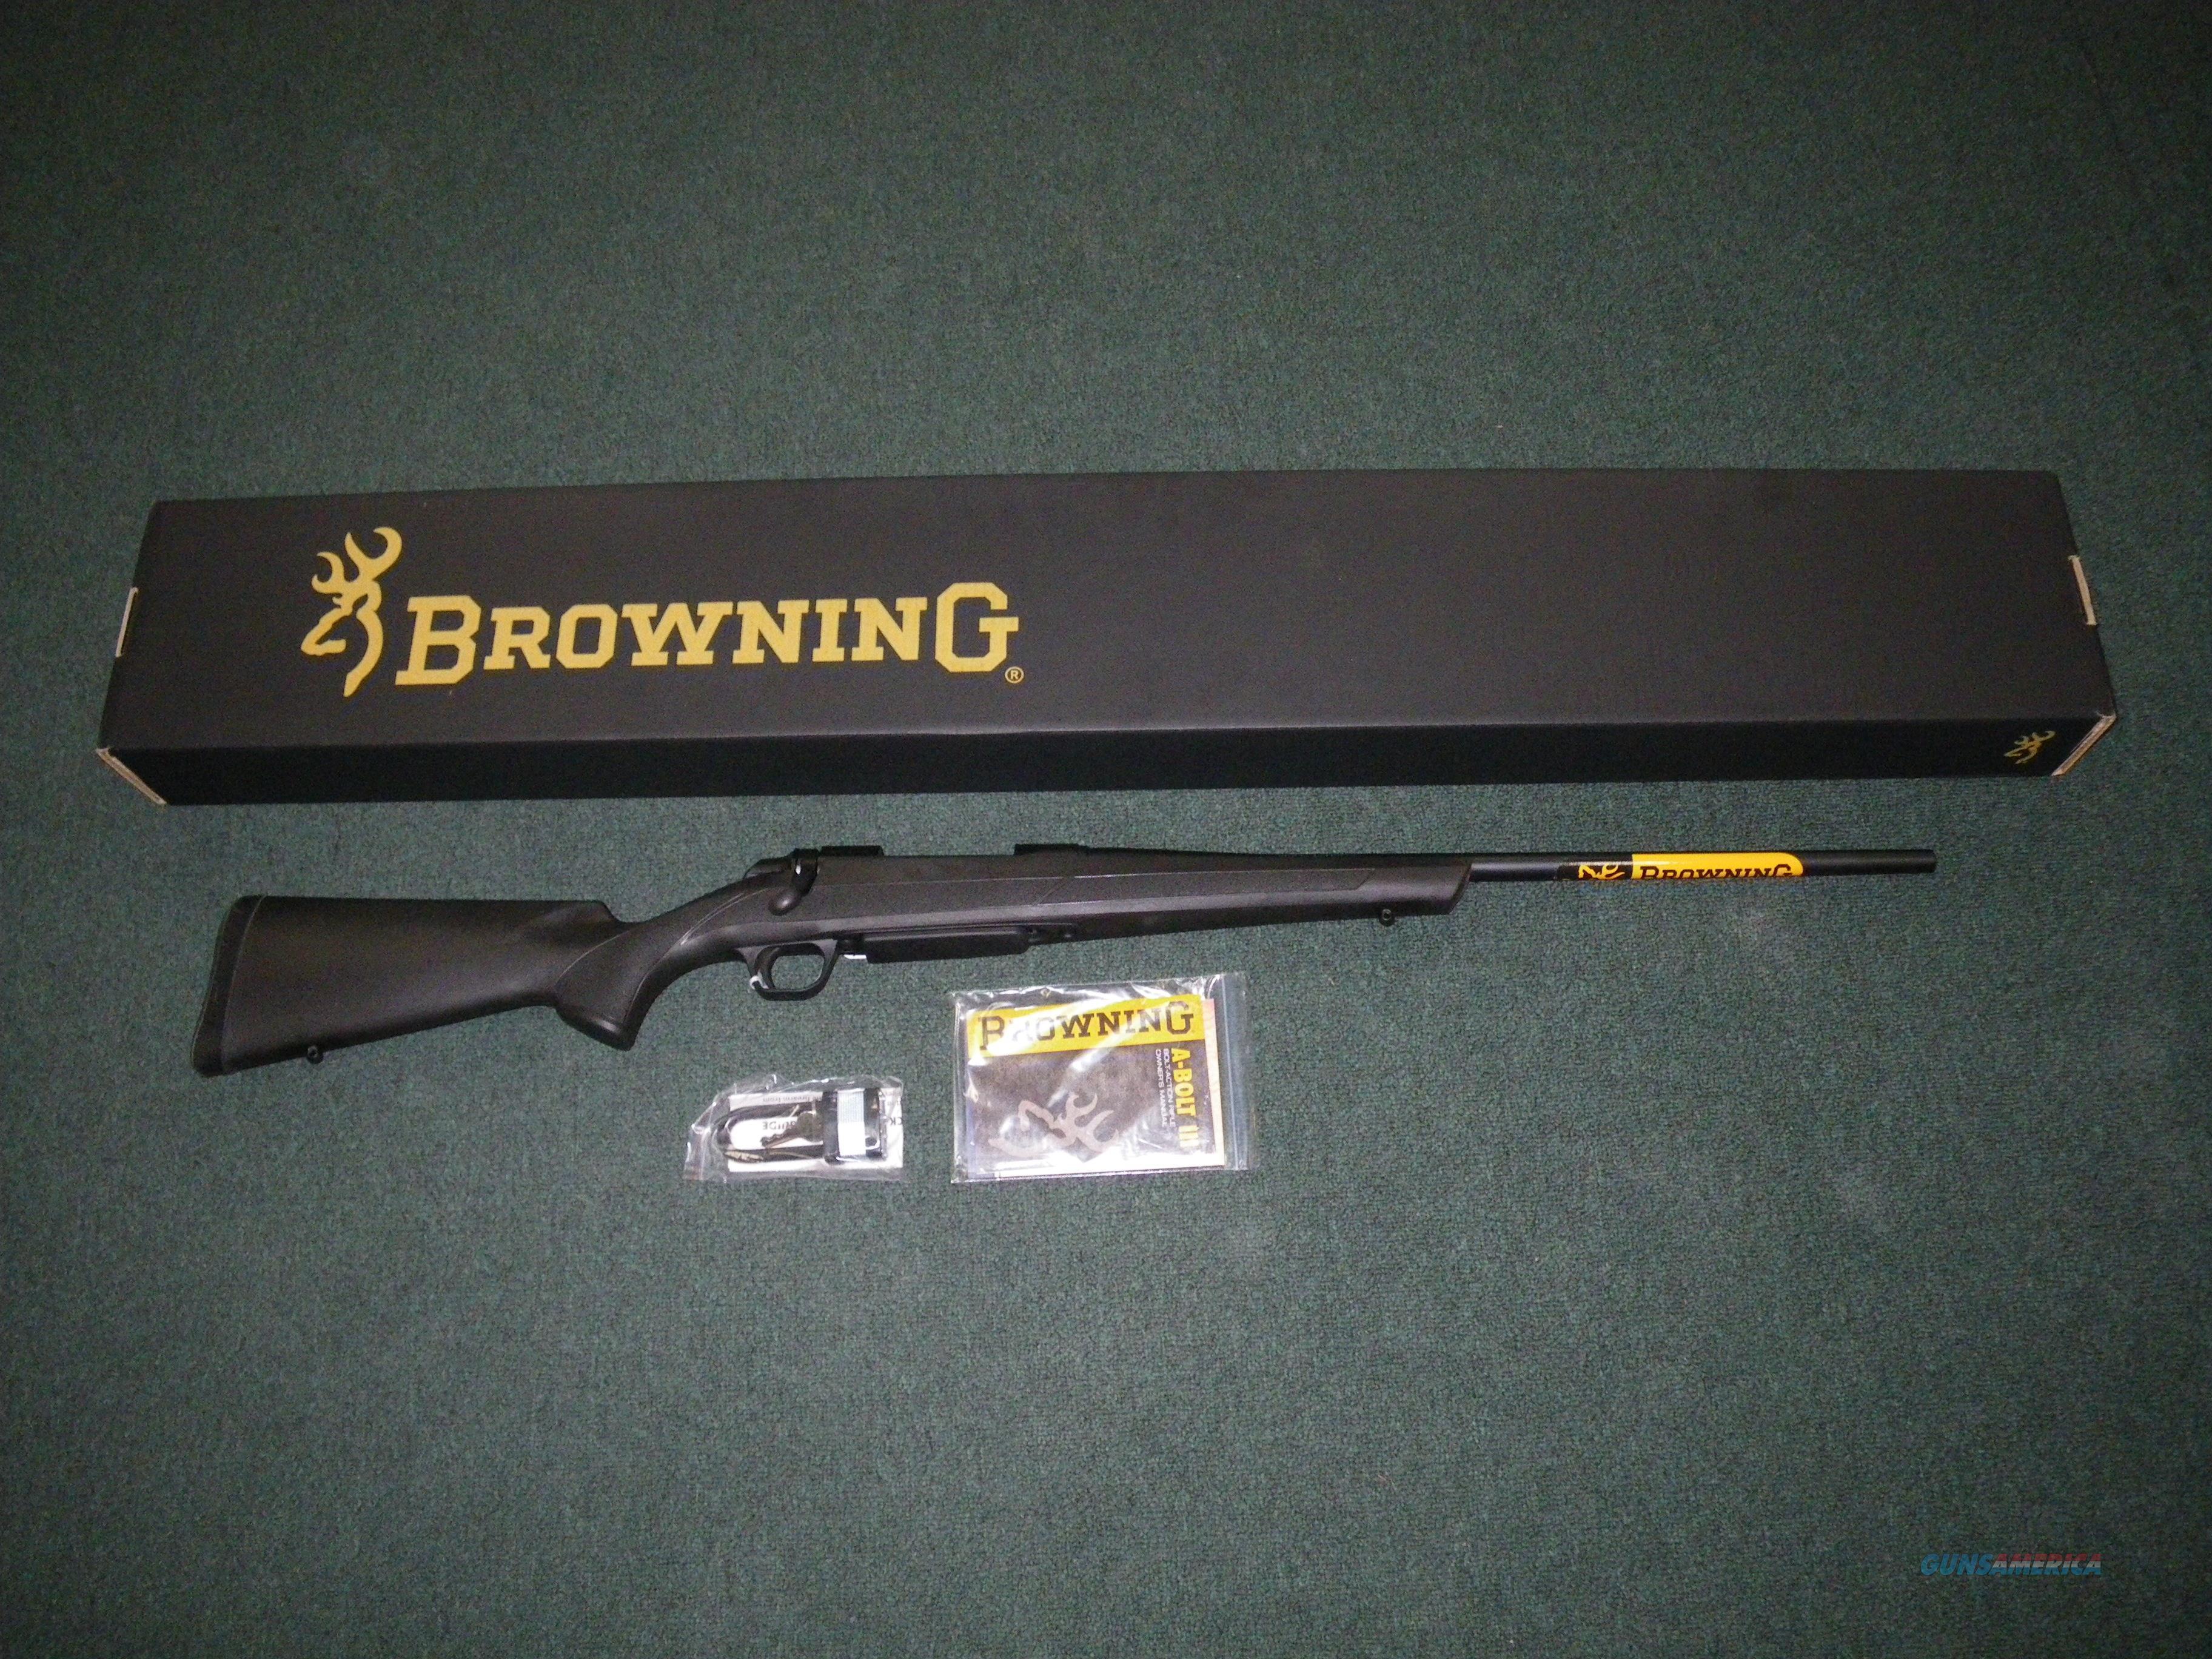 "Browning A-bolt III AB3 22"" 6.5 Creedmoor New! #035800282  Guns > Rifles > Browning Rifles > Bolt Action > Hunting > Blue"